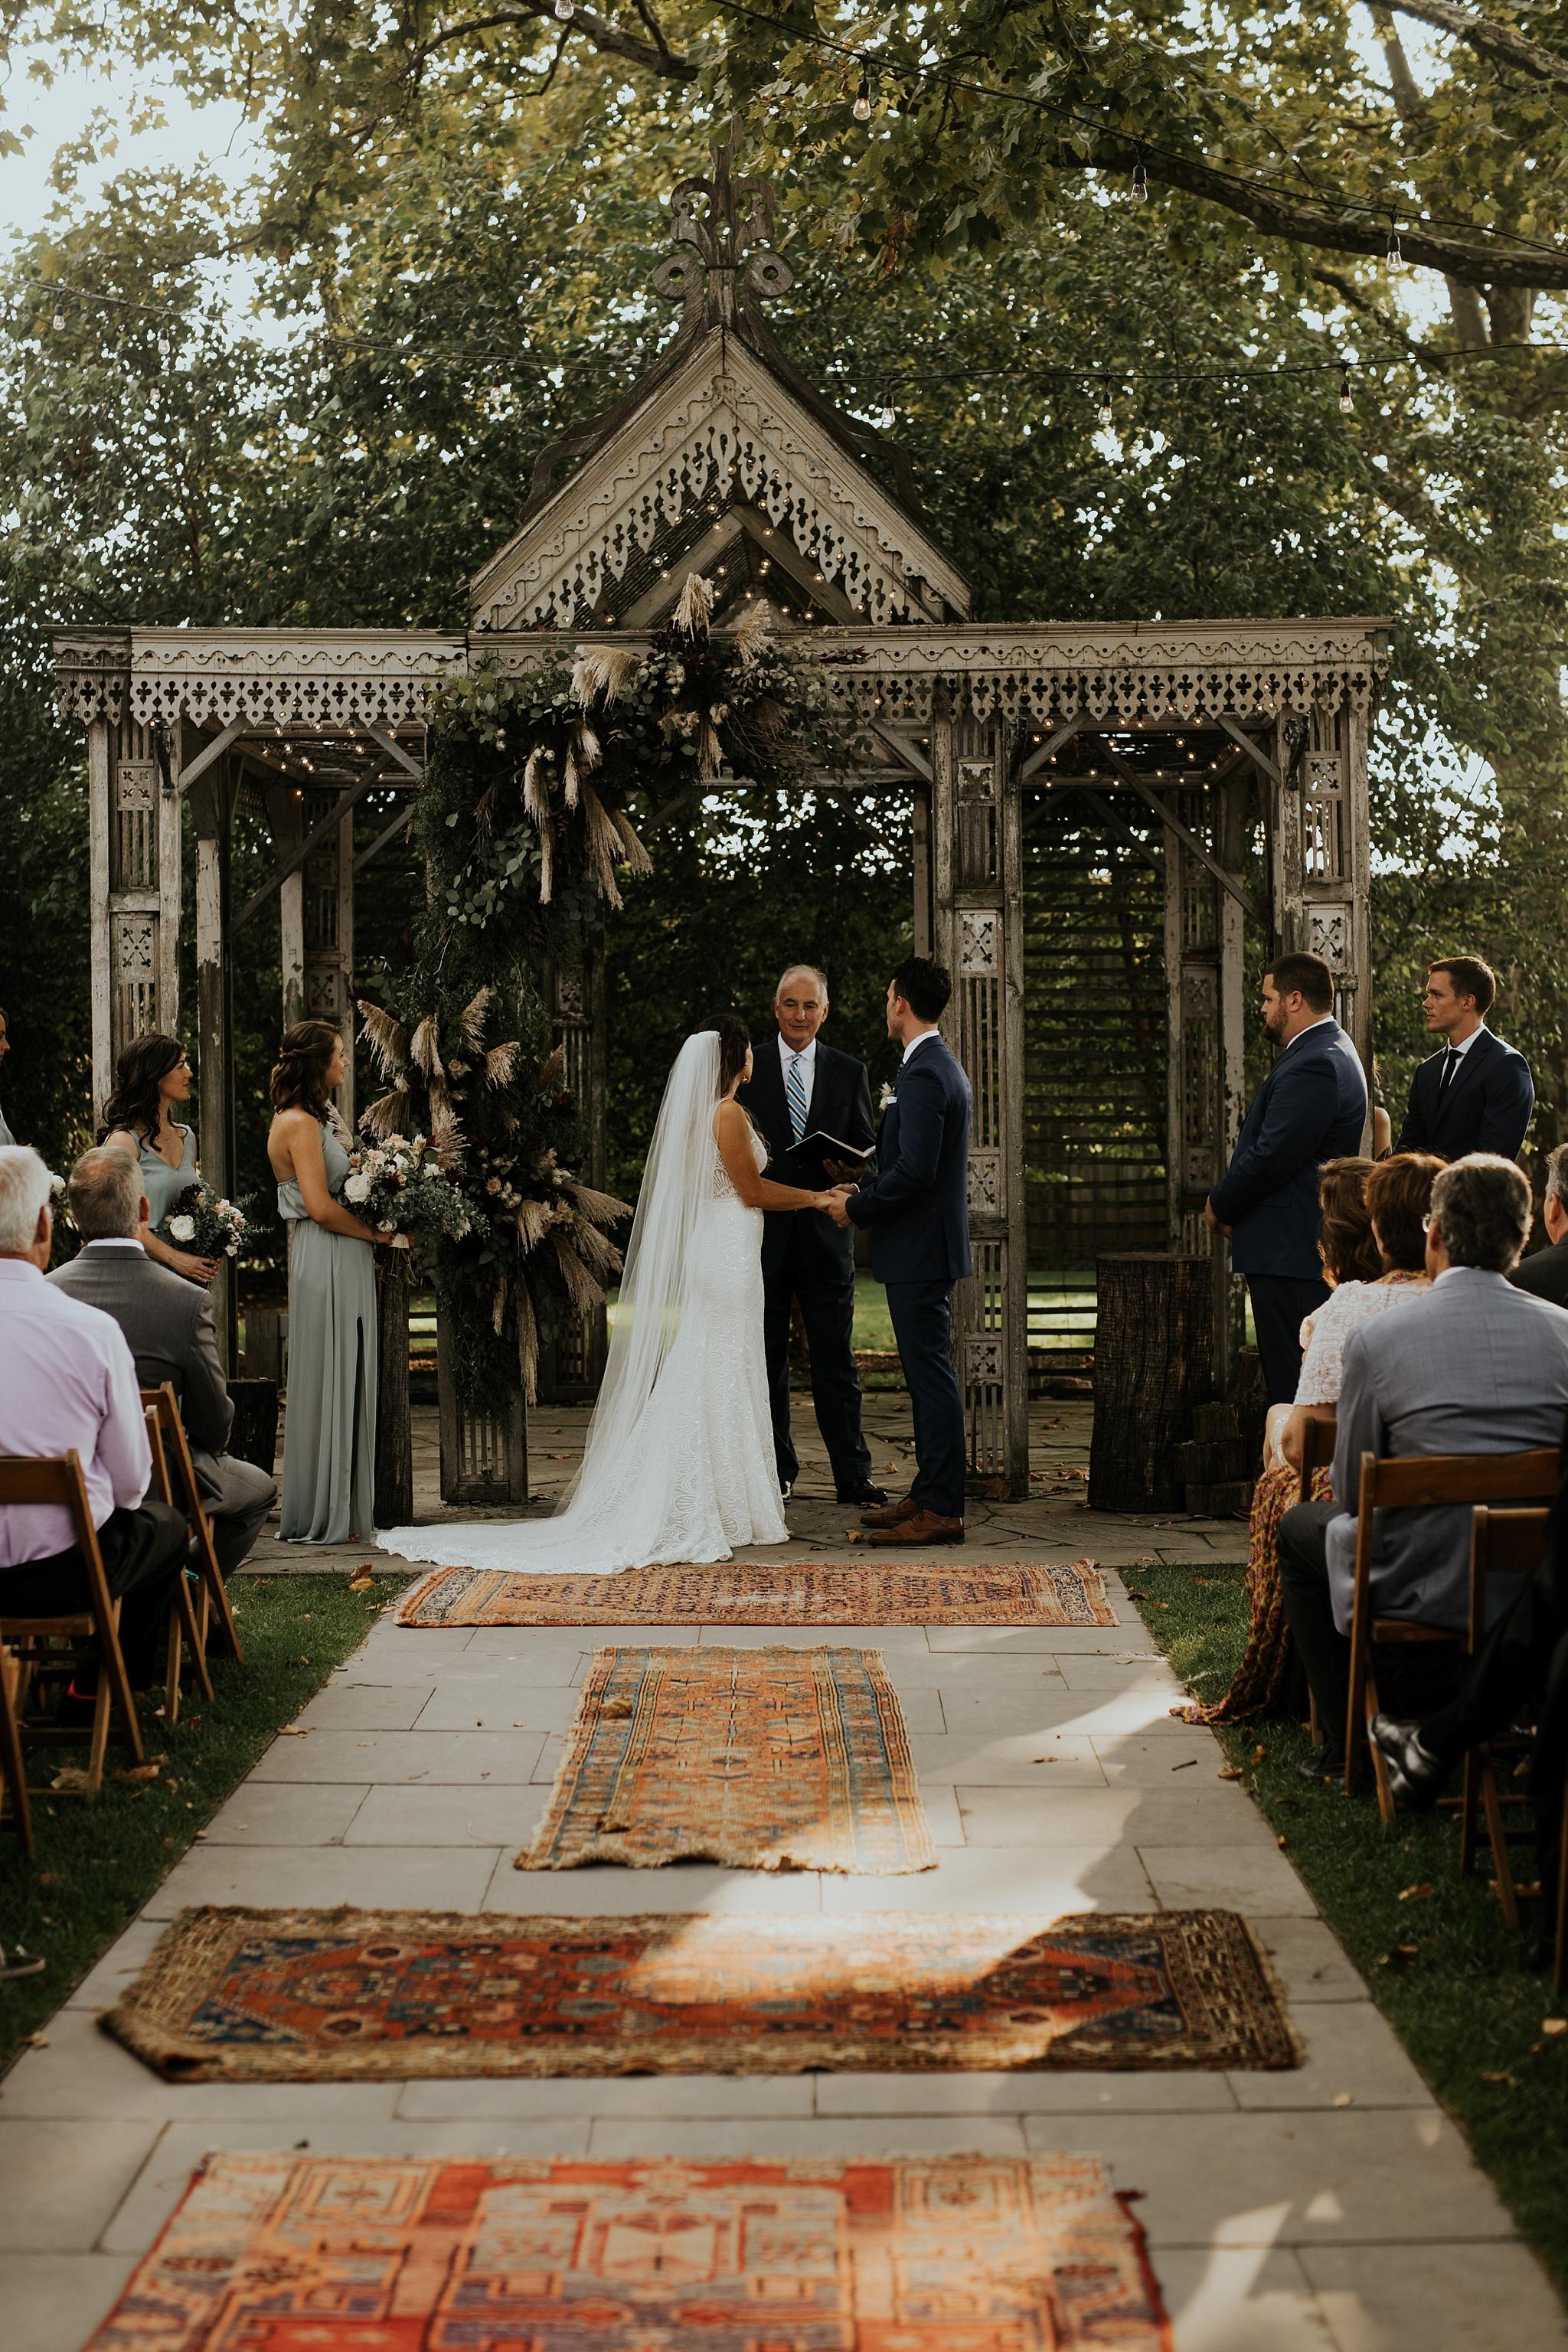 Heartfelt Botanical Terrain at Styers Wedding in Glenn Mills Pennslyvania by Trin Jensen Photography_0028.jpg